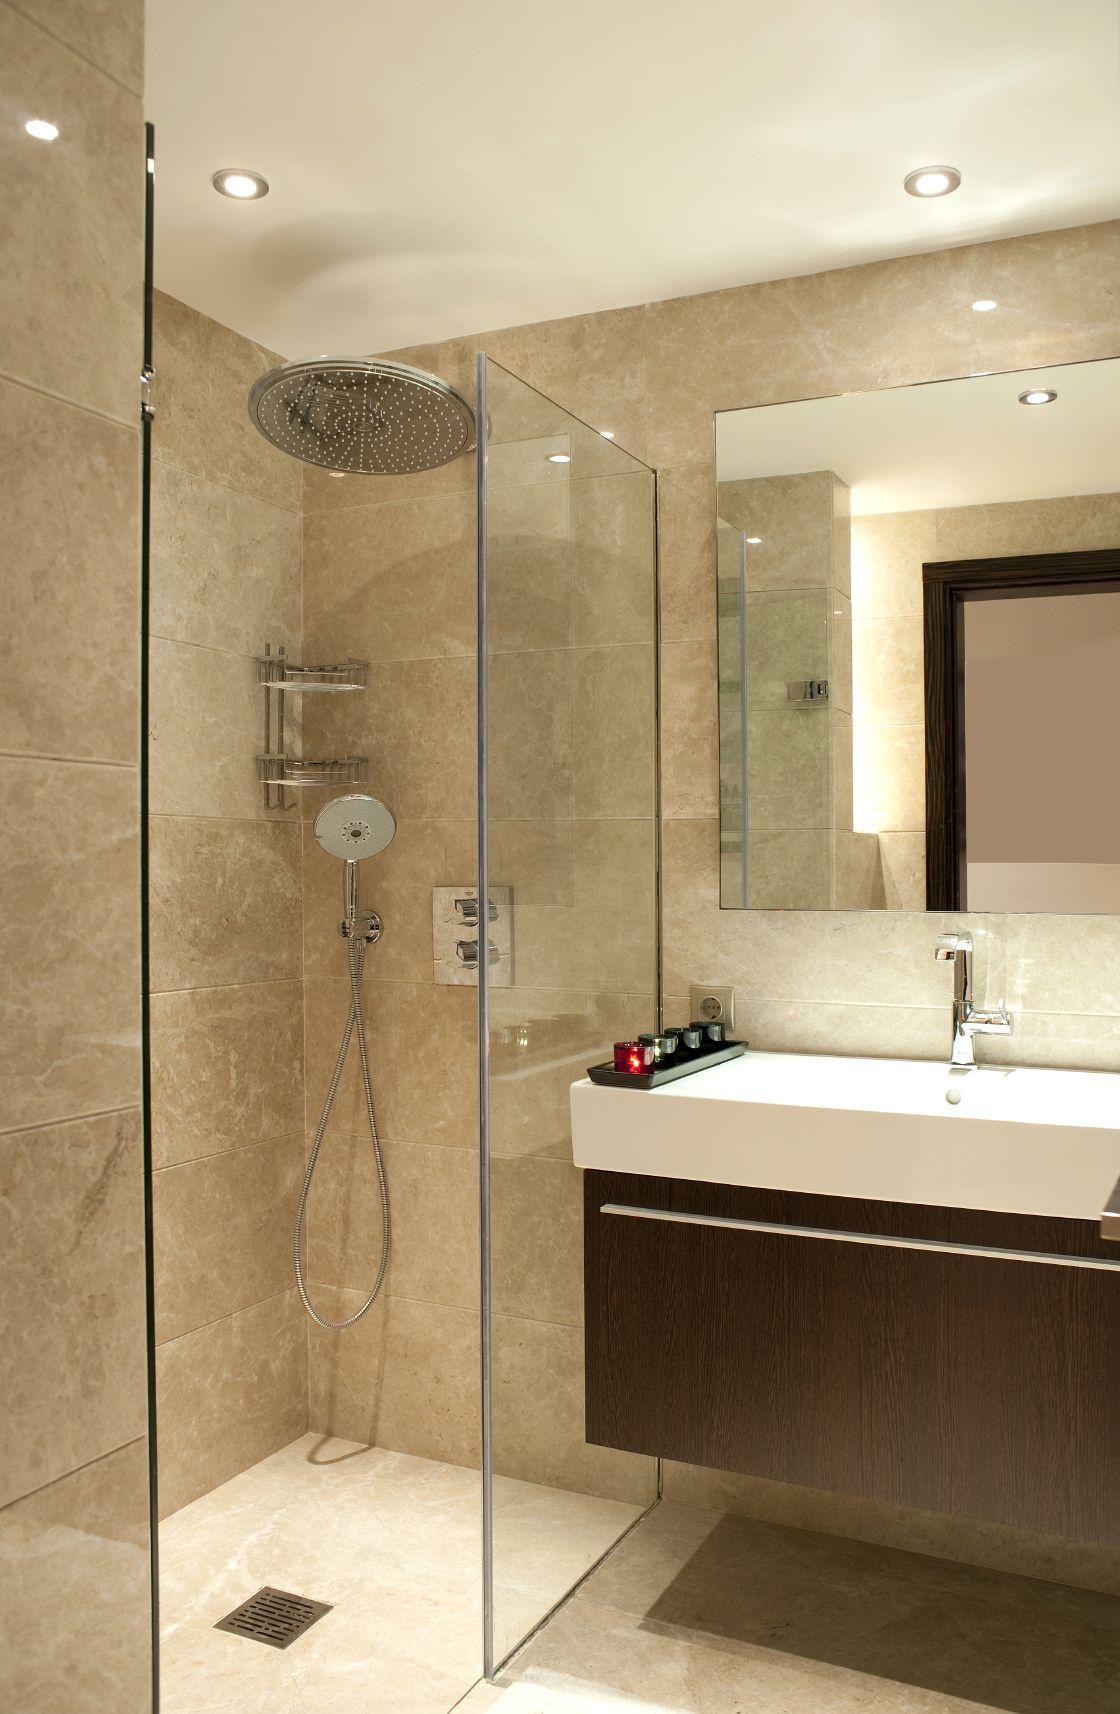 15 Stunning Ensuite Bathrooms Design Ideas Idee Salle De Bain Douche Chalet Salle De Bain